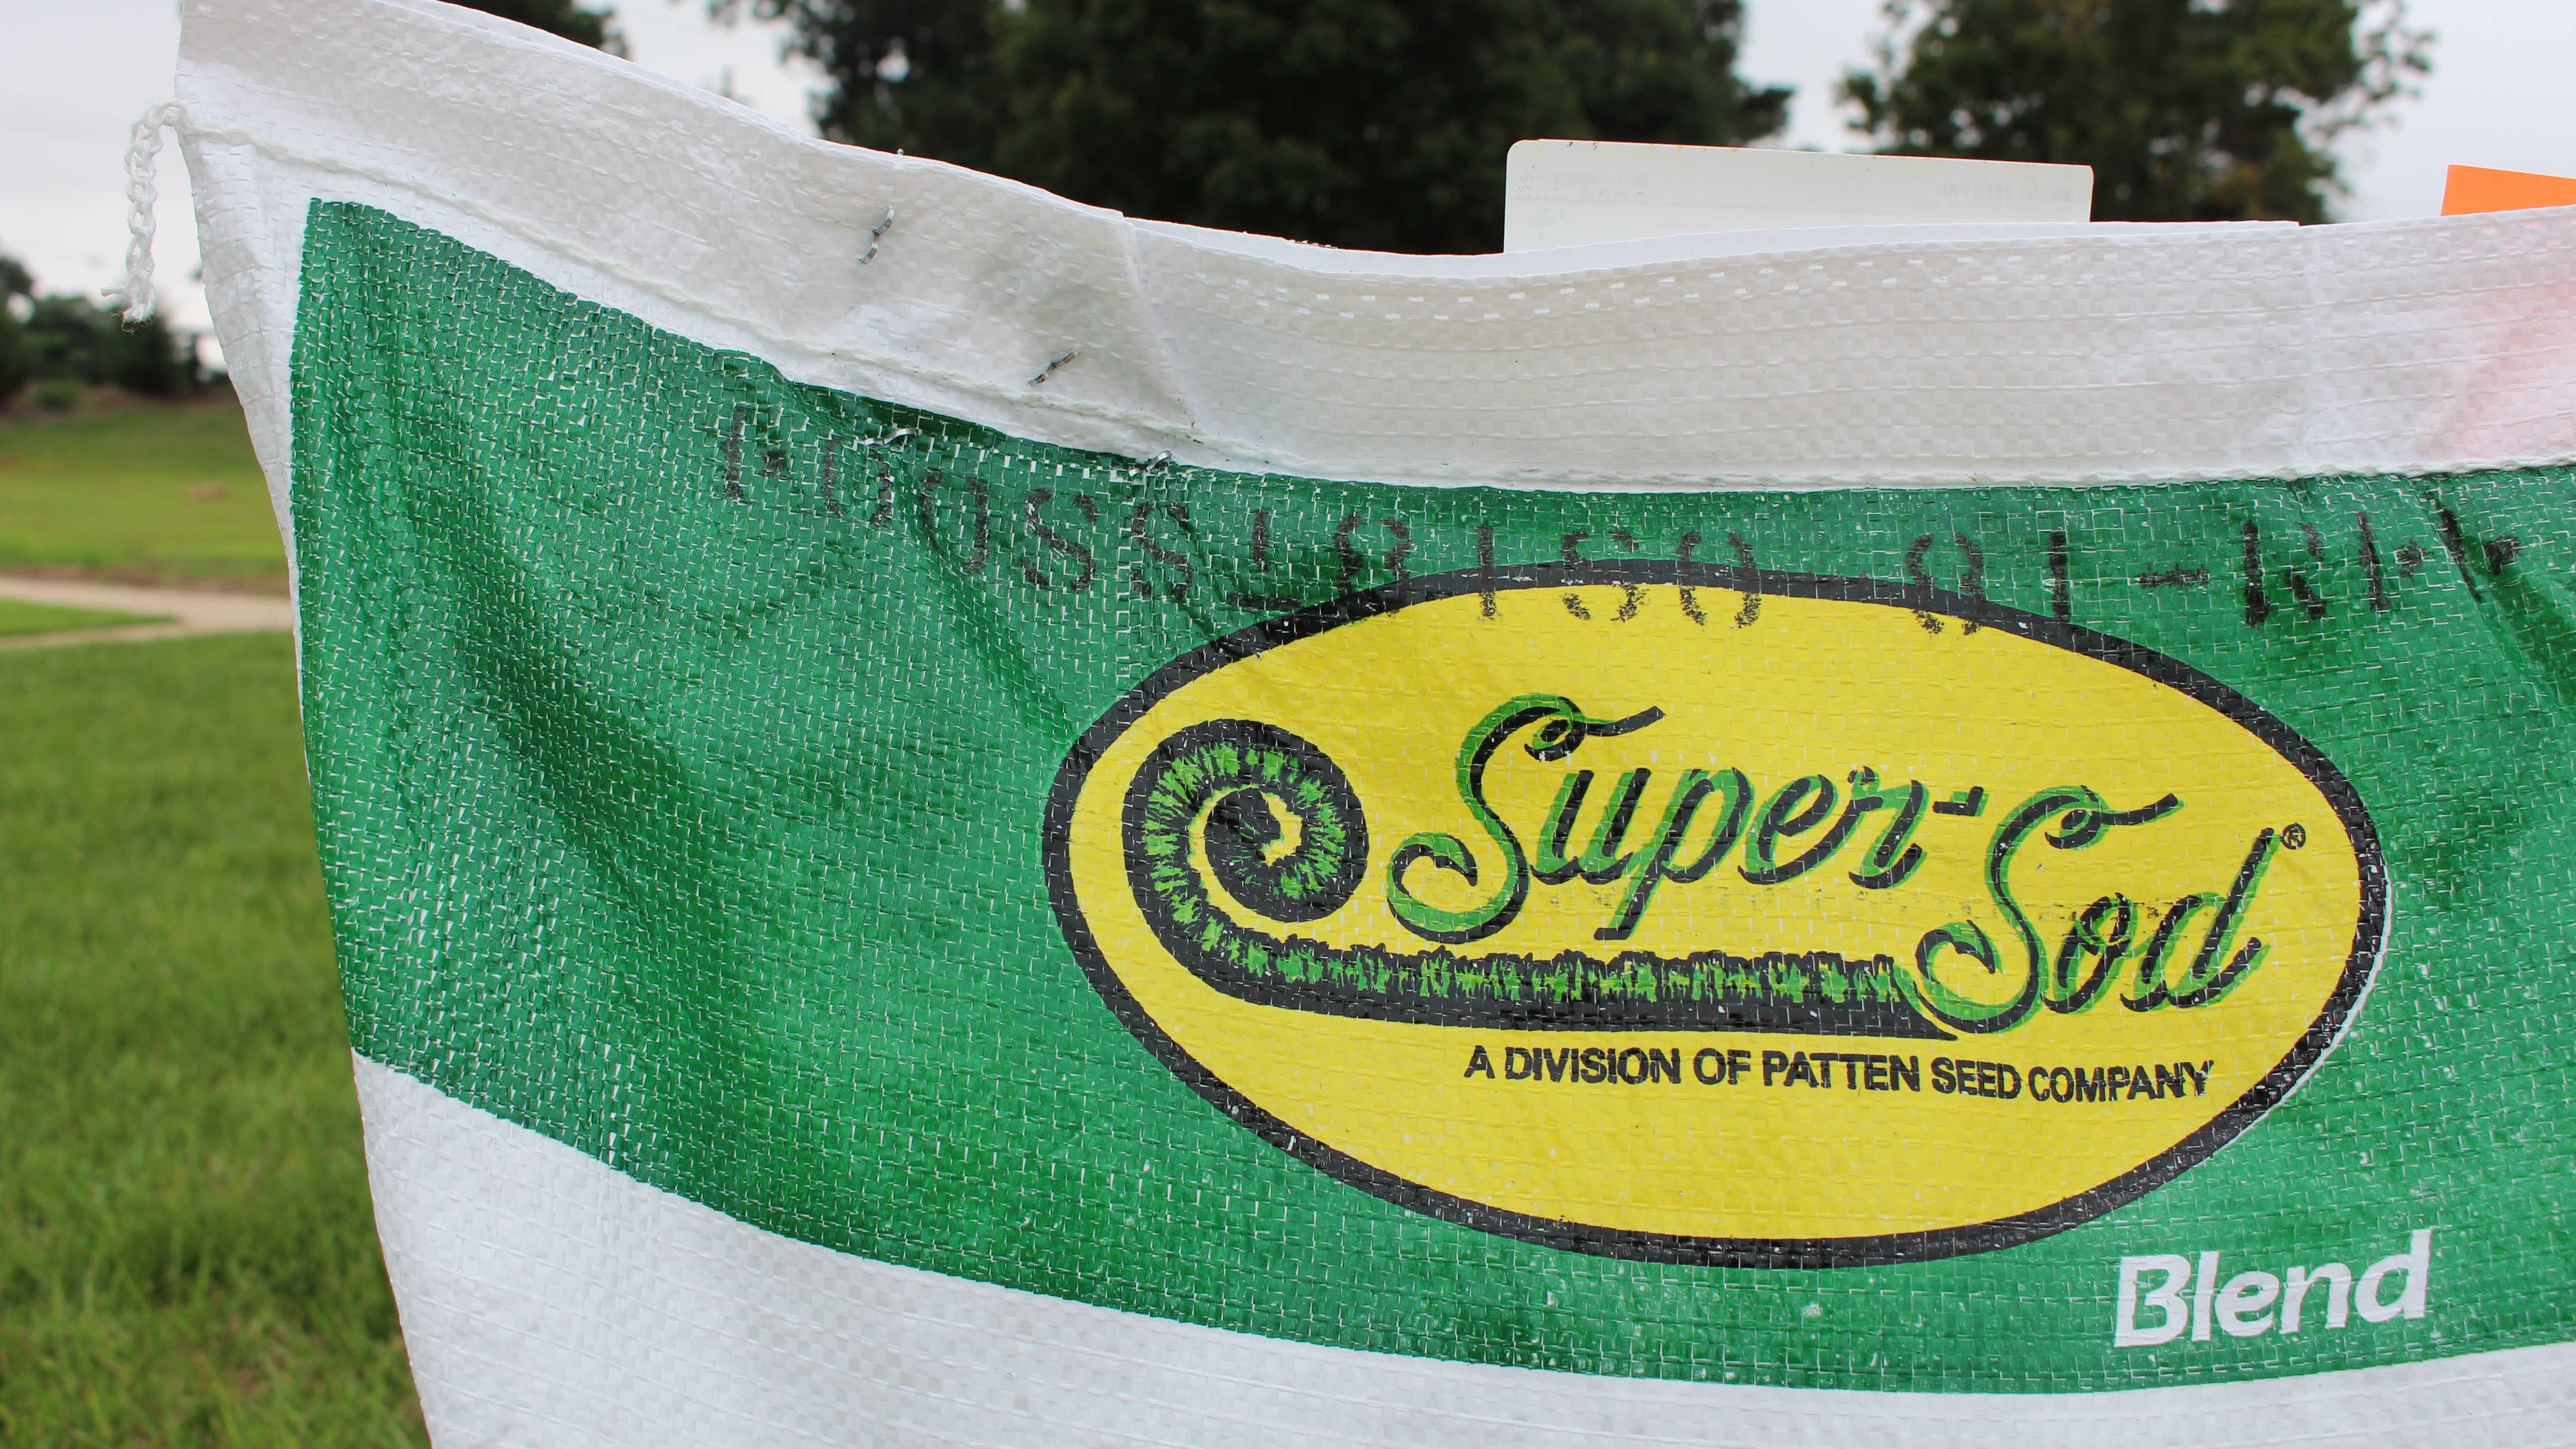 super-sod fescue seed bag